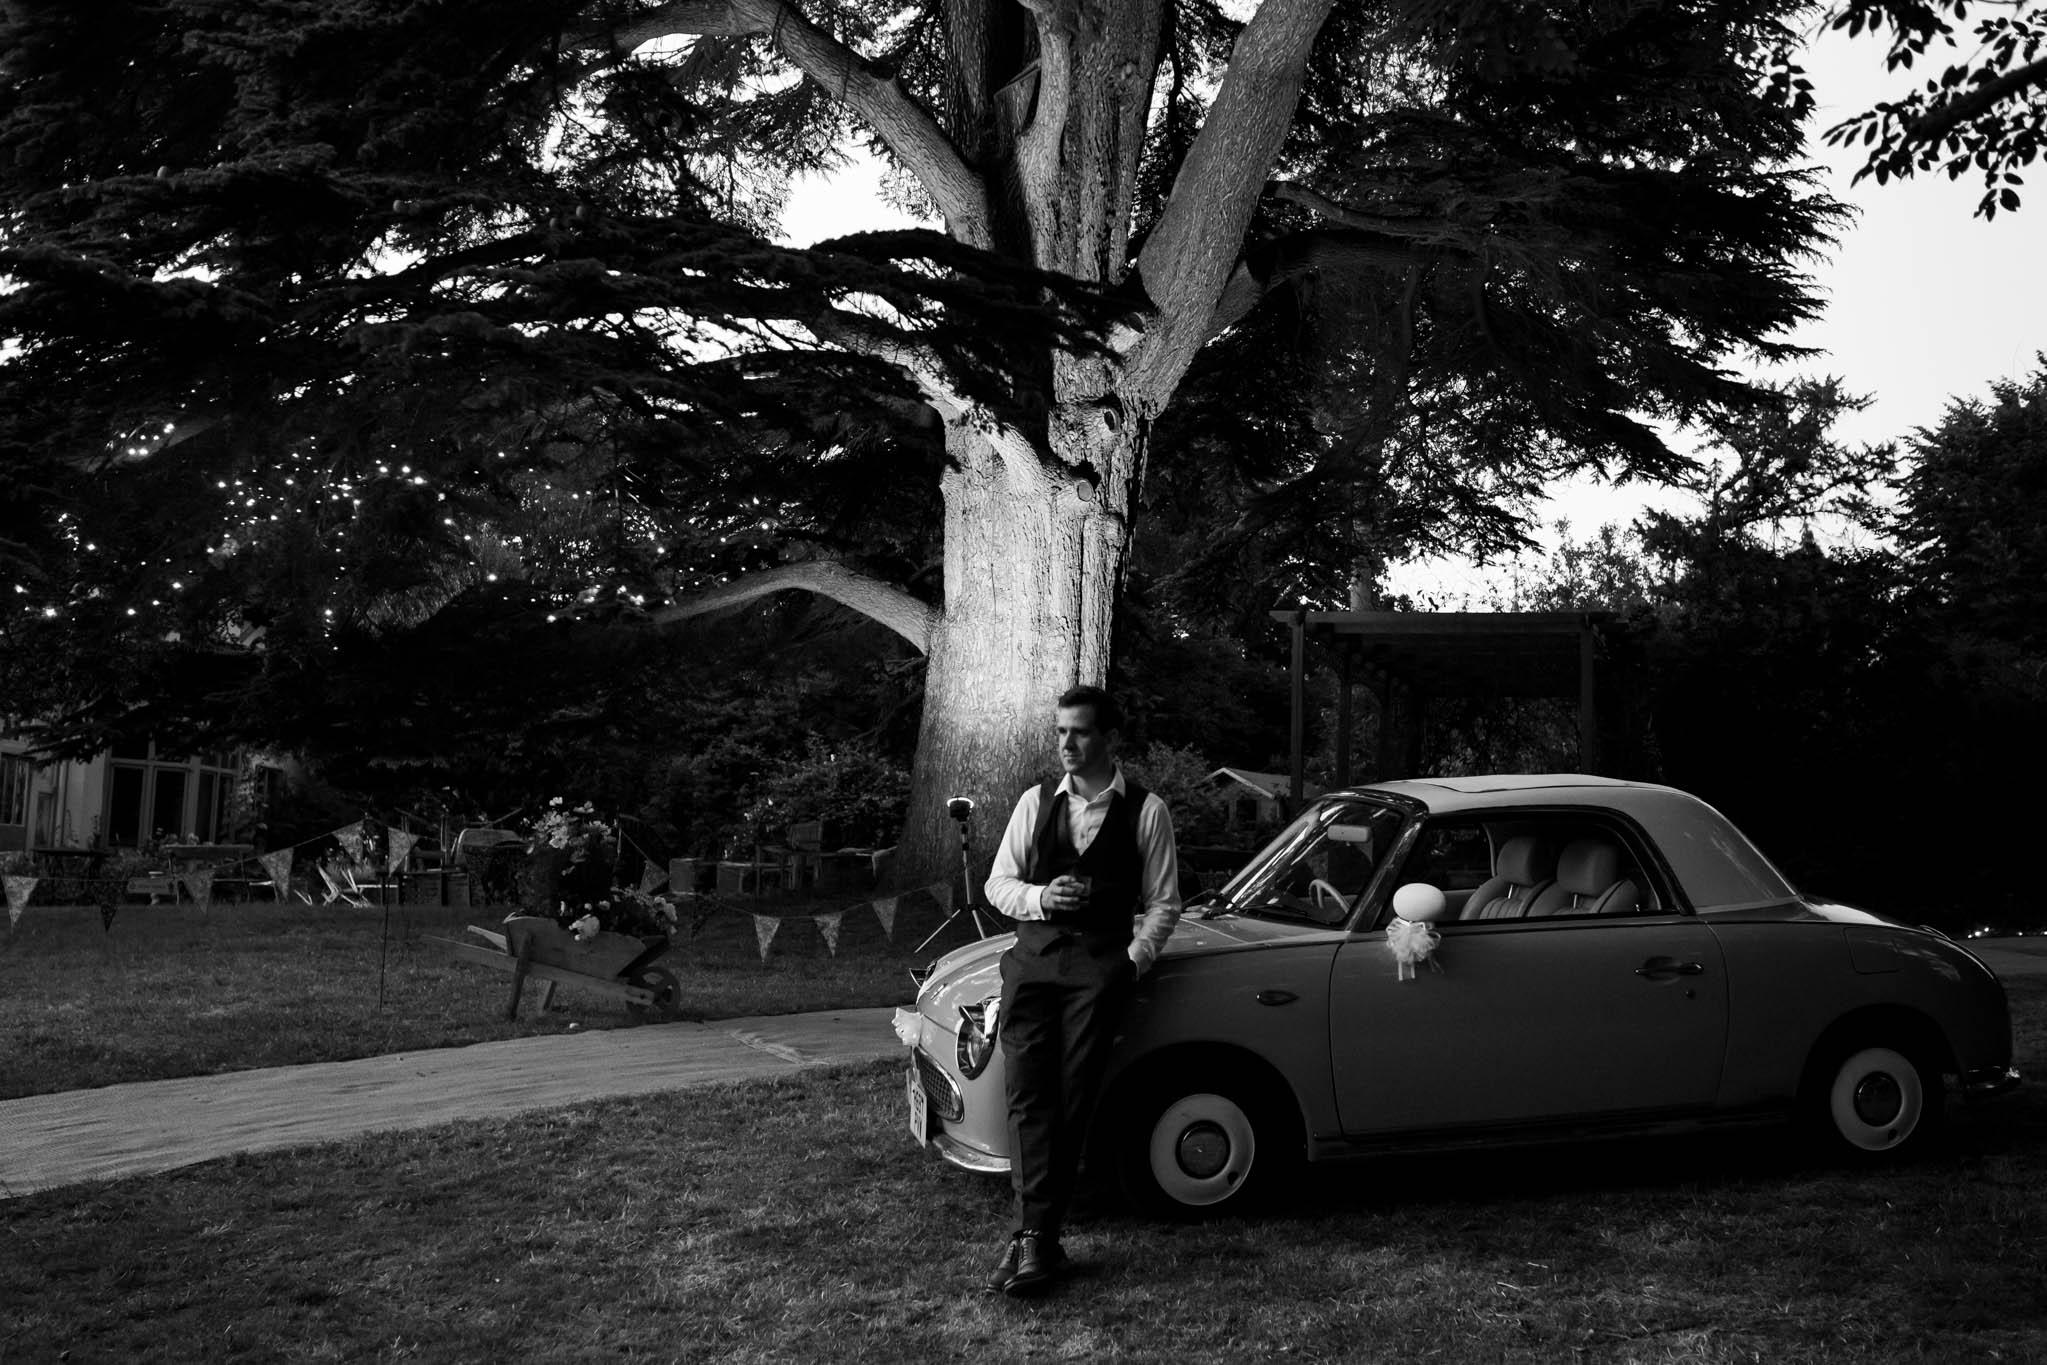 groom sitting on vintage car at night- alice in wonderland wedding